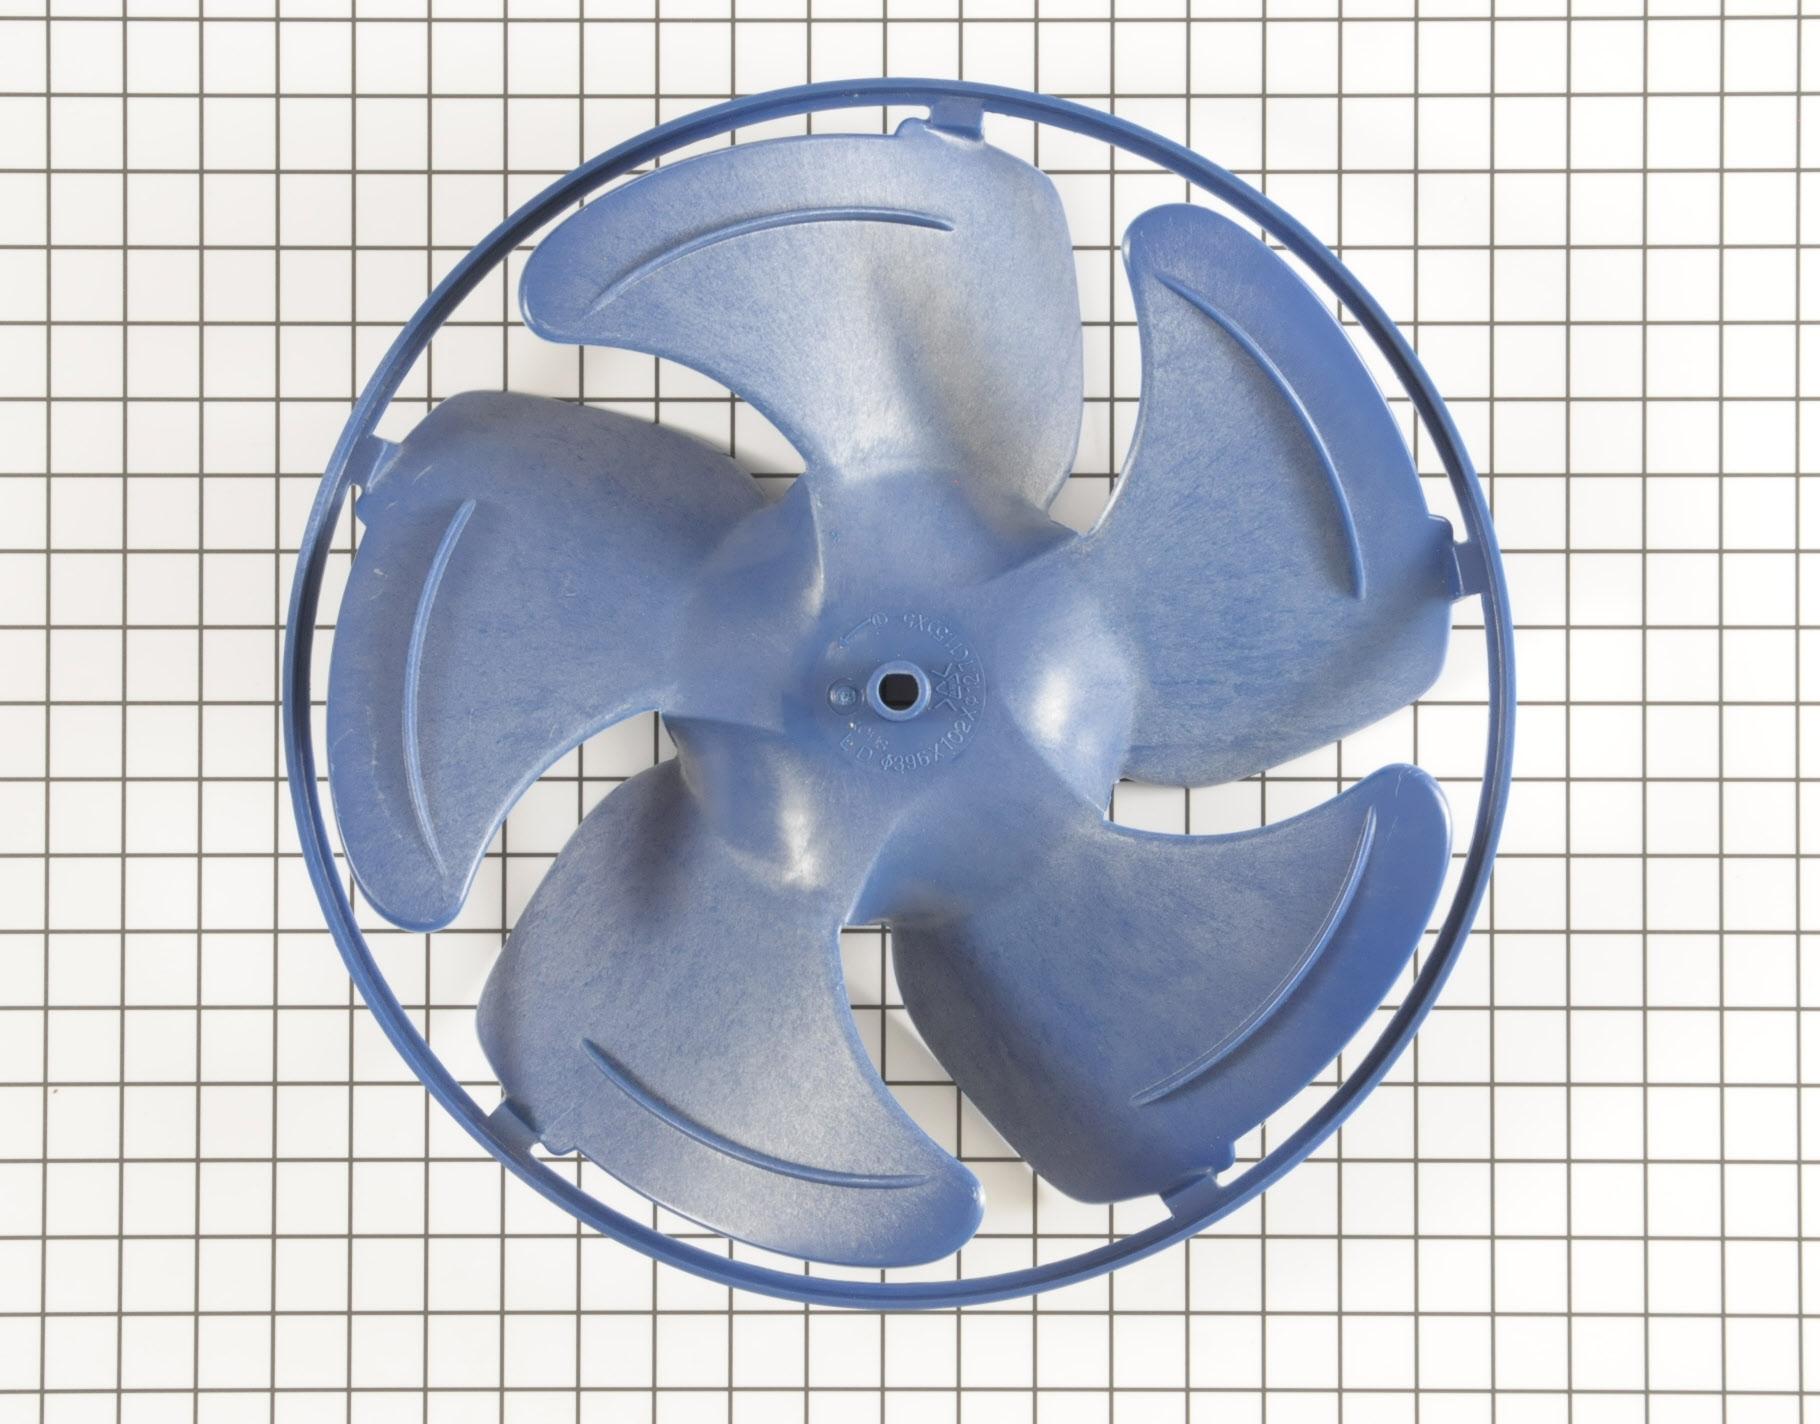 Kenmore Air Conditioner Part # 5304472356 - Fan Blade